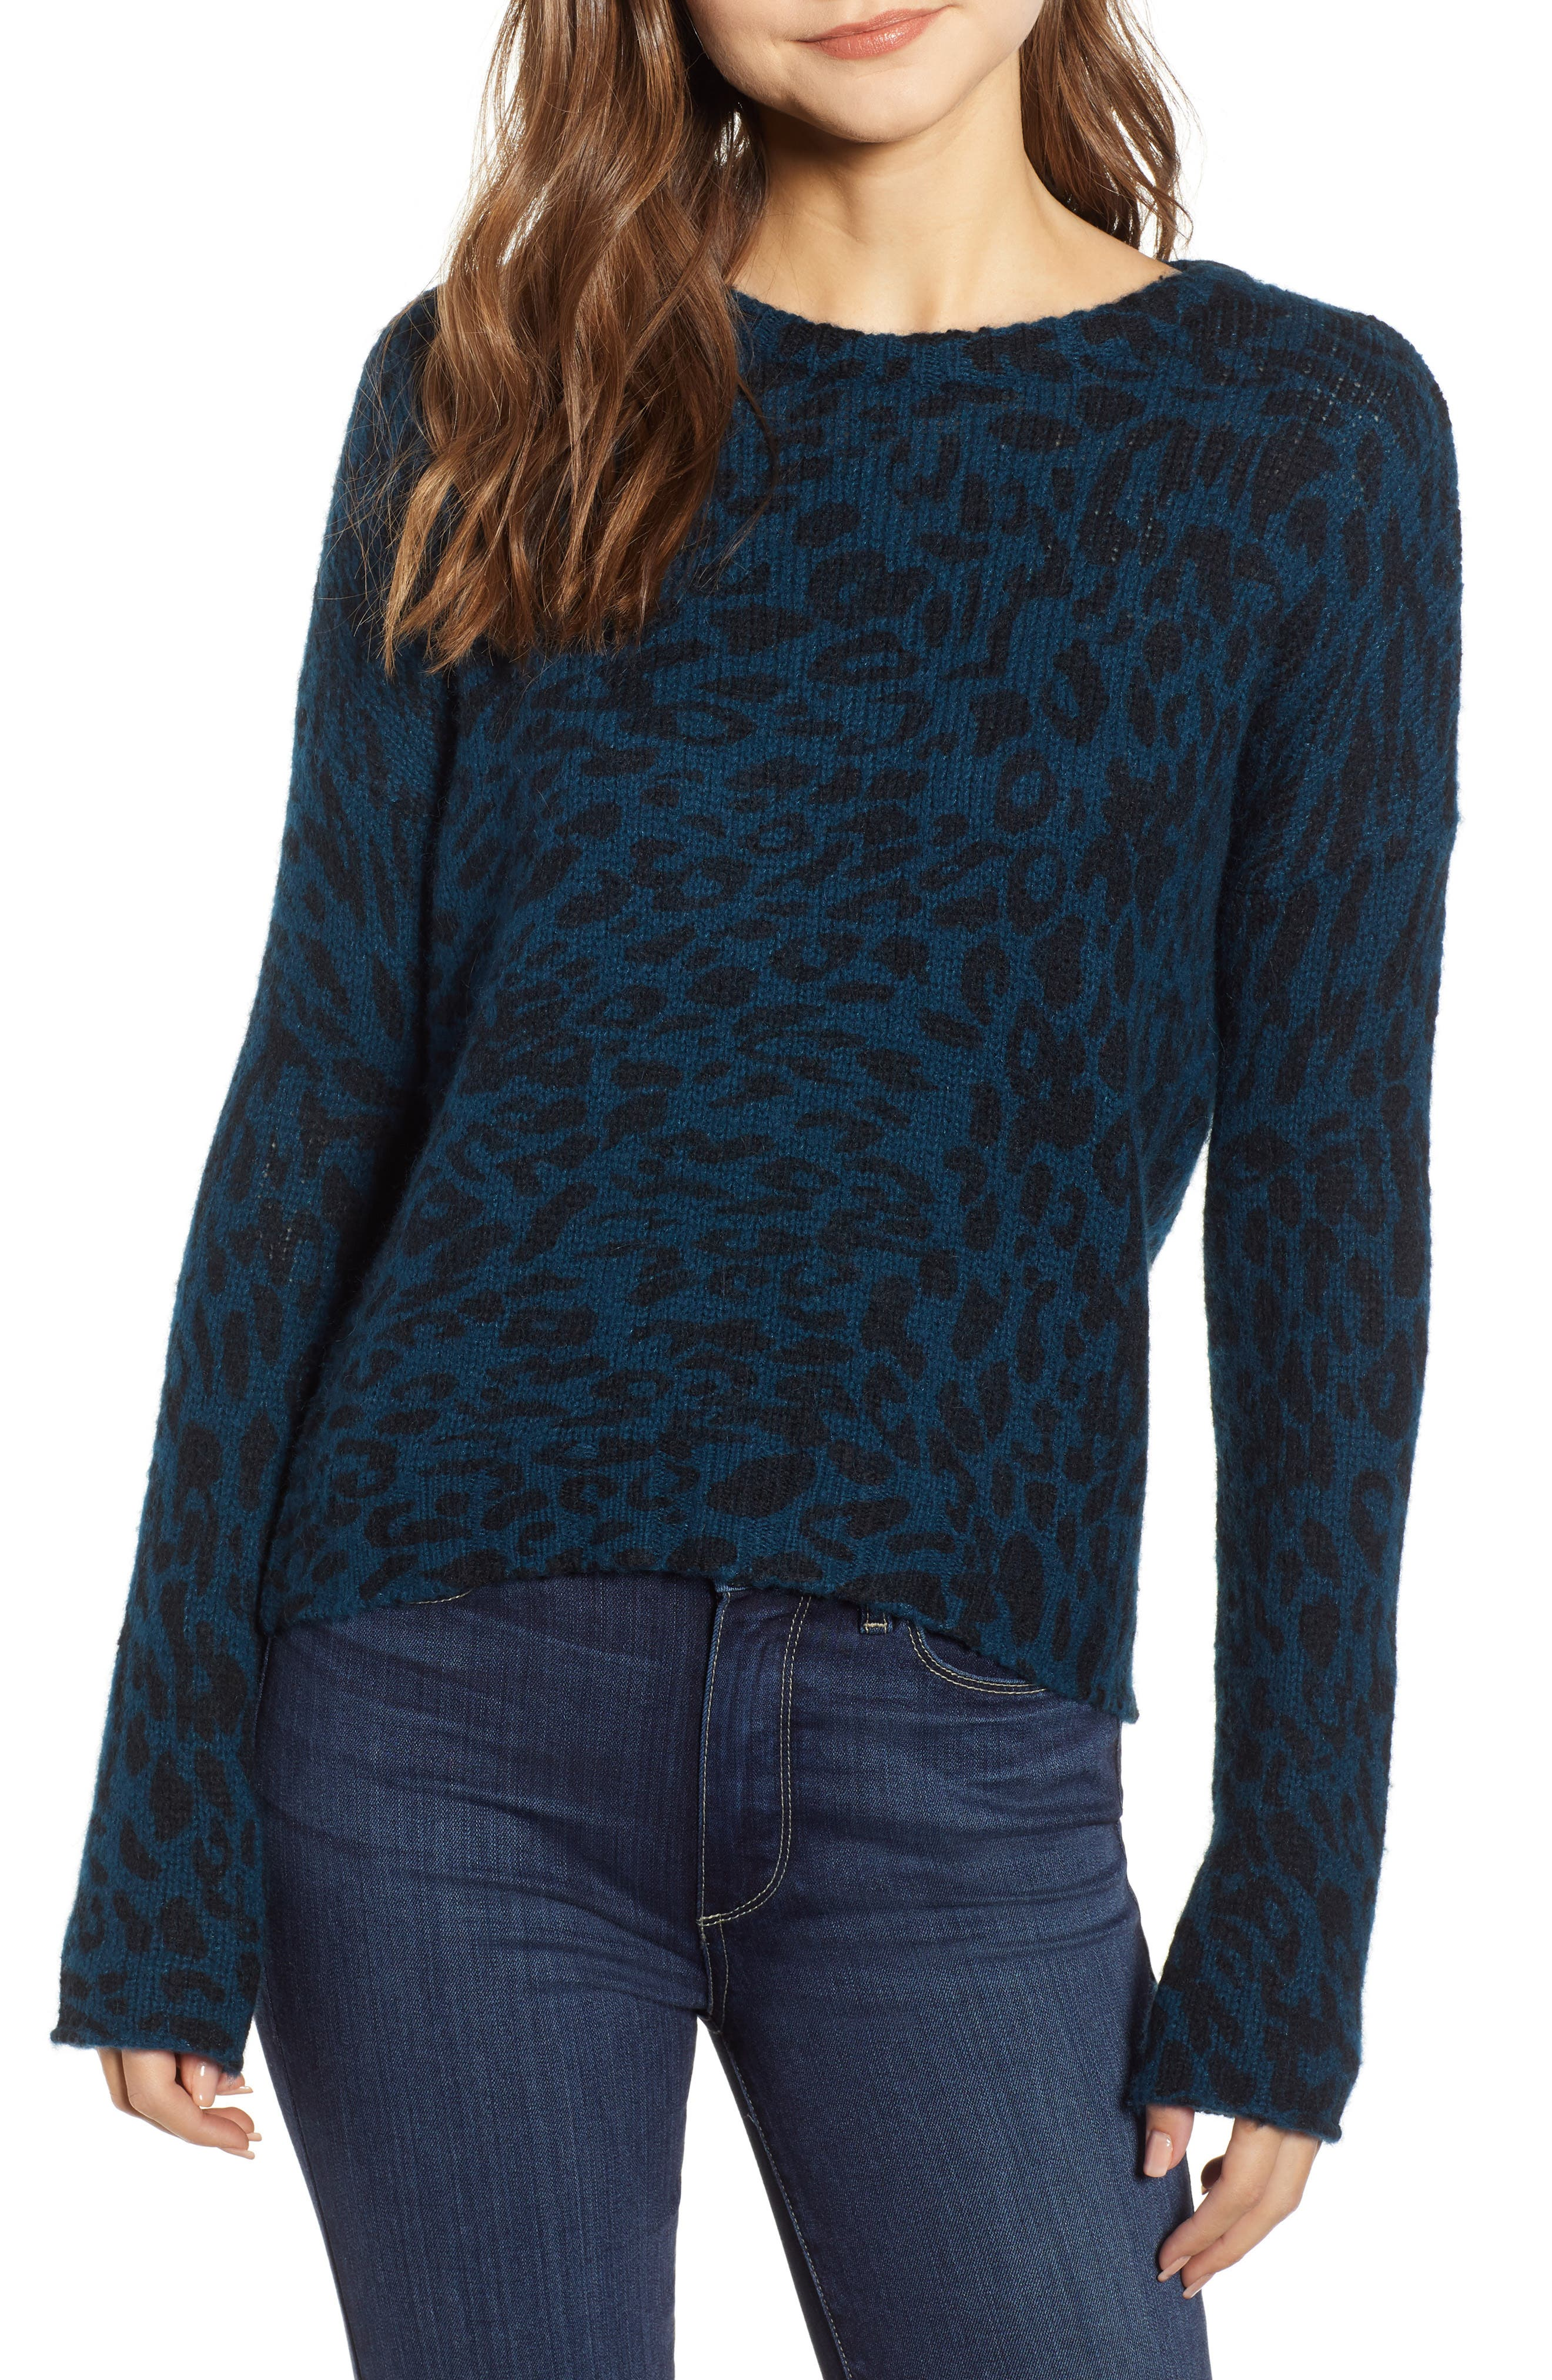 Donovan Animal Print Sweater,                             Main thumbnail 1, color,                             BLUE LEOPARD